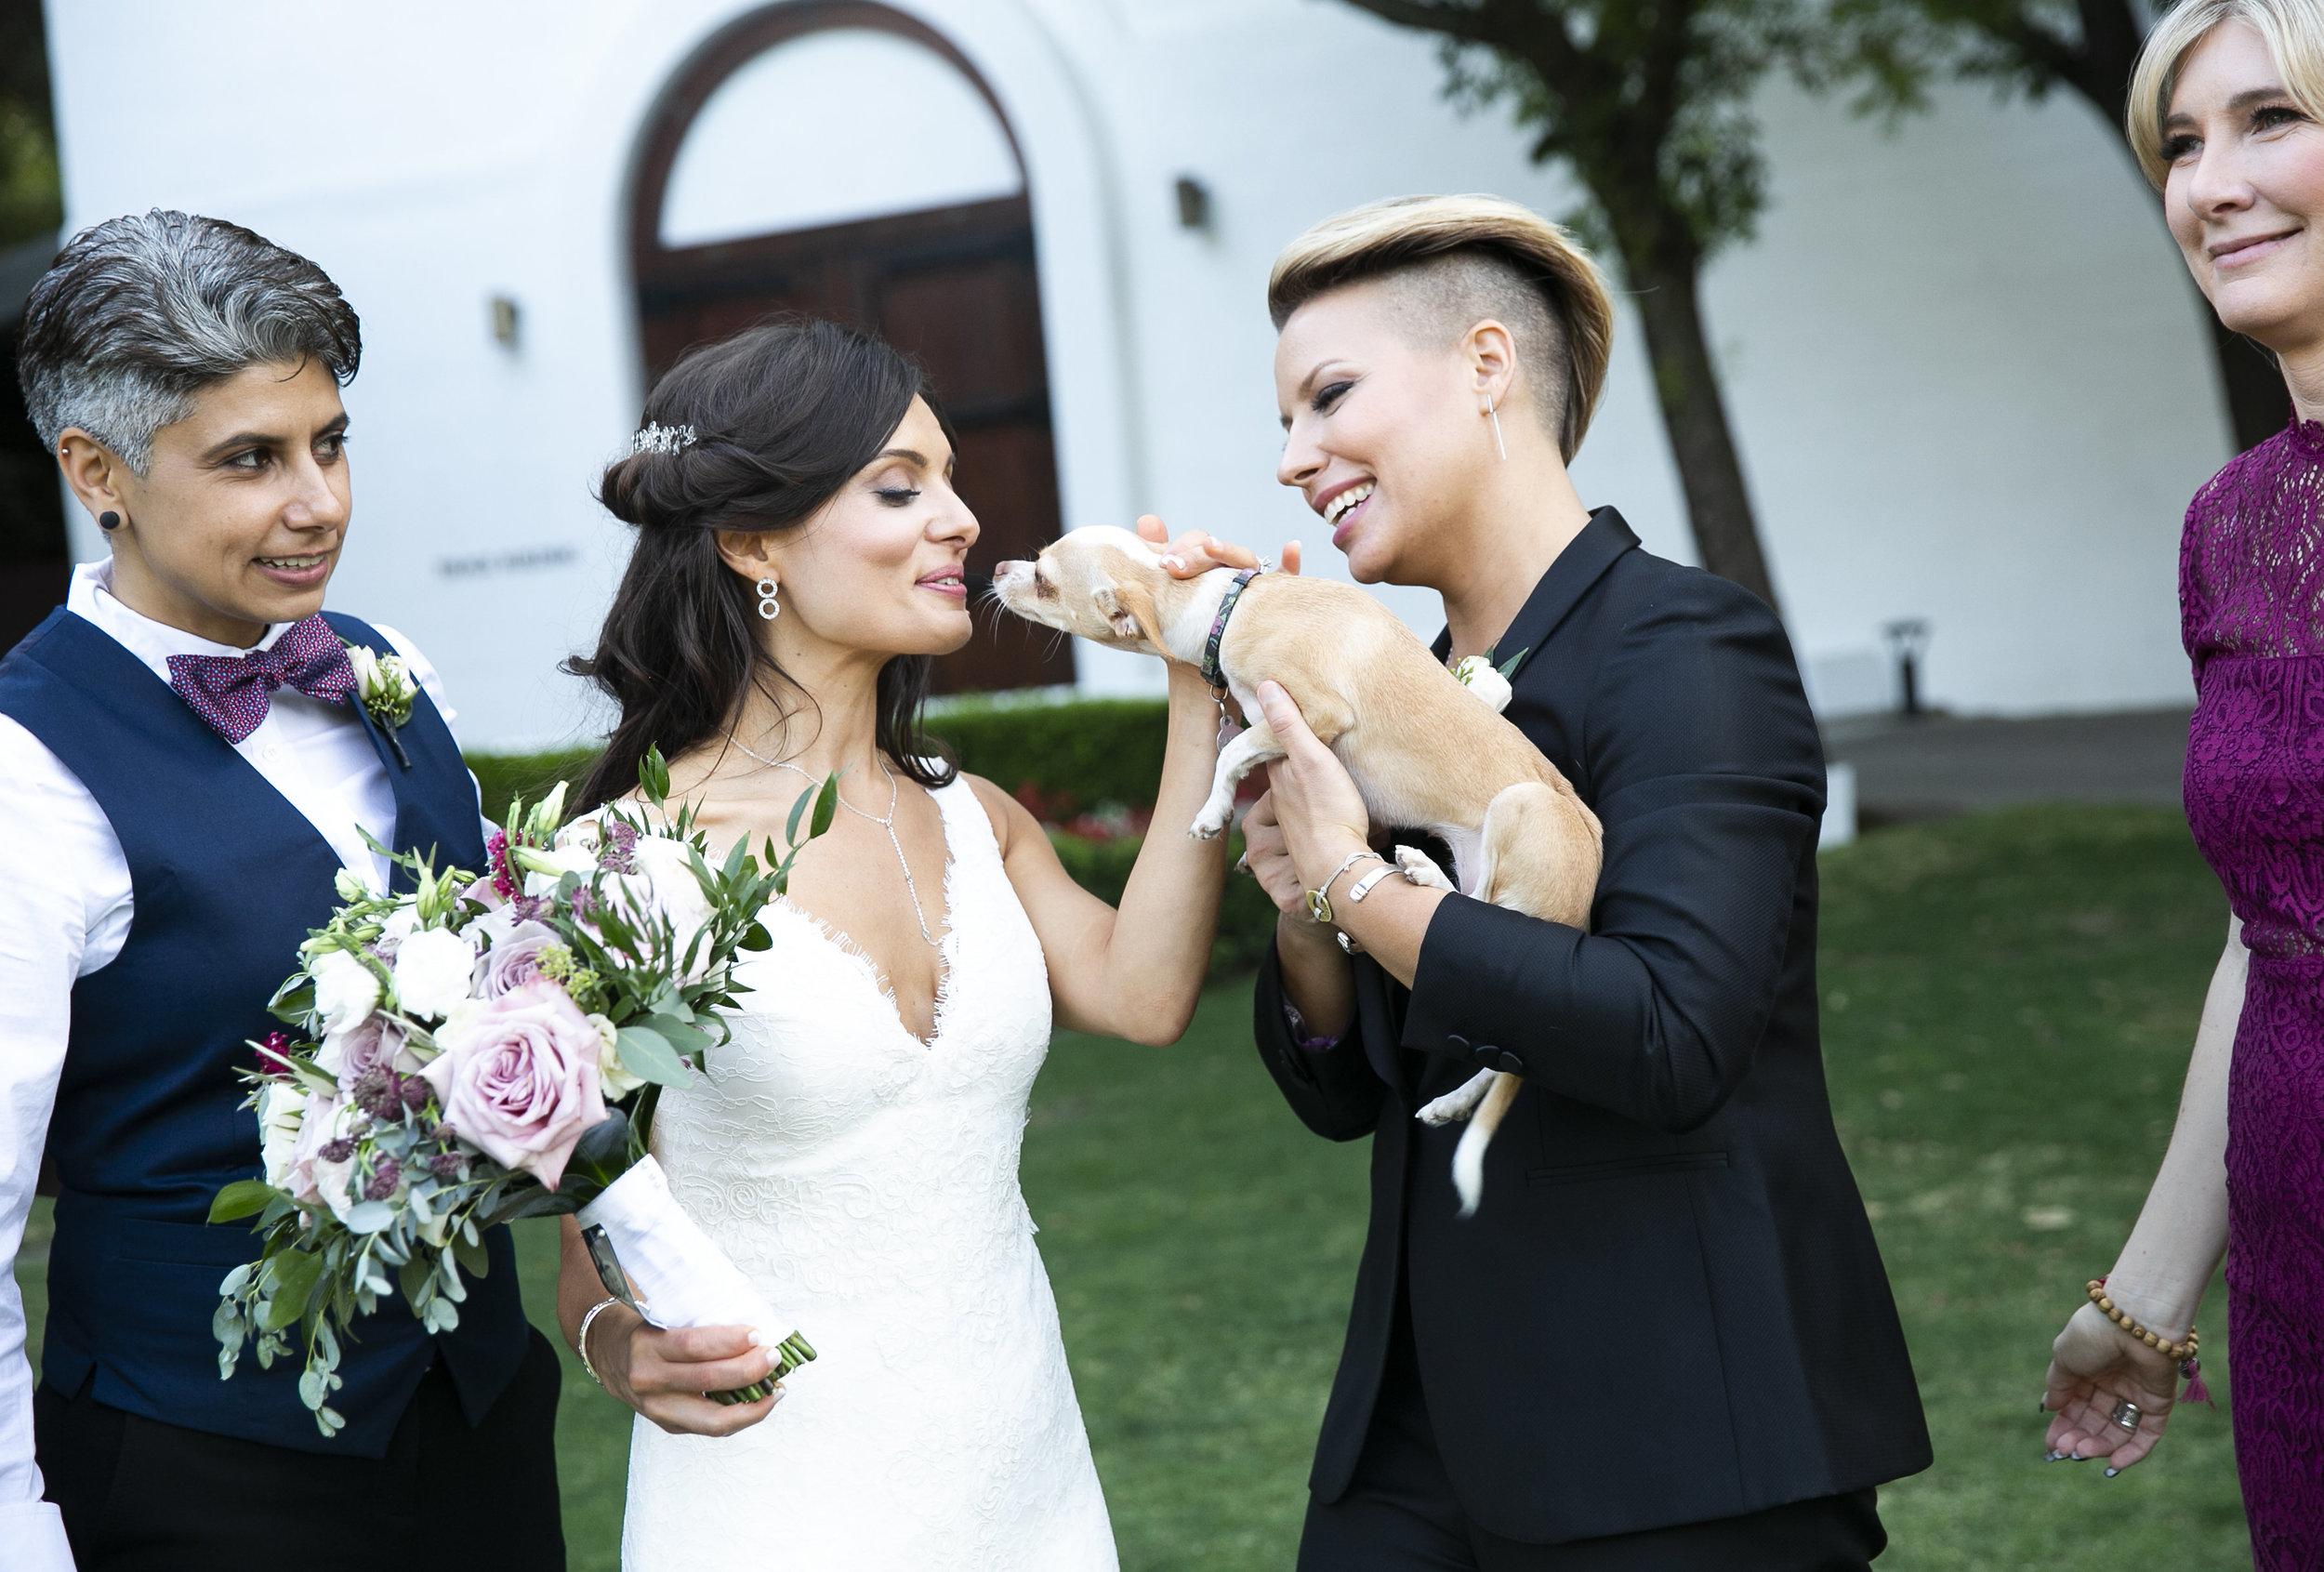 marialee_makeup_gay_wedding_gina&jess_5.JPG